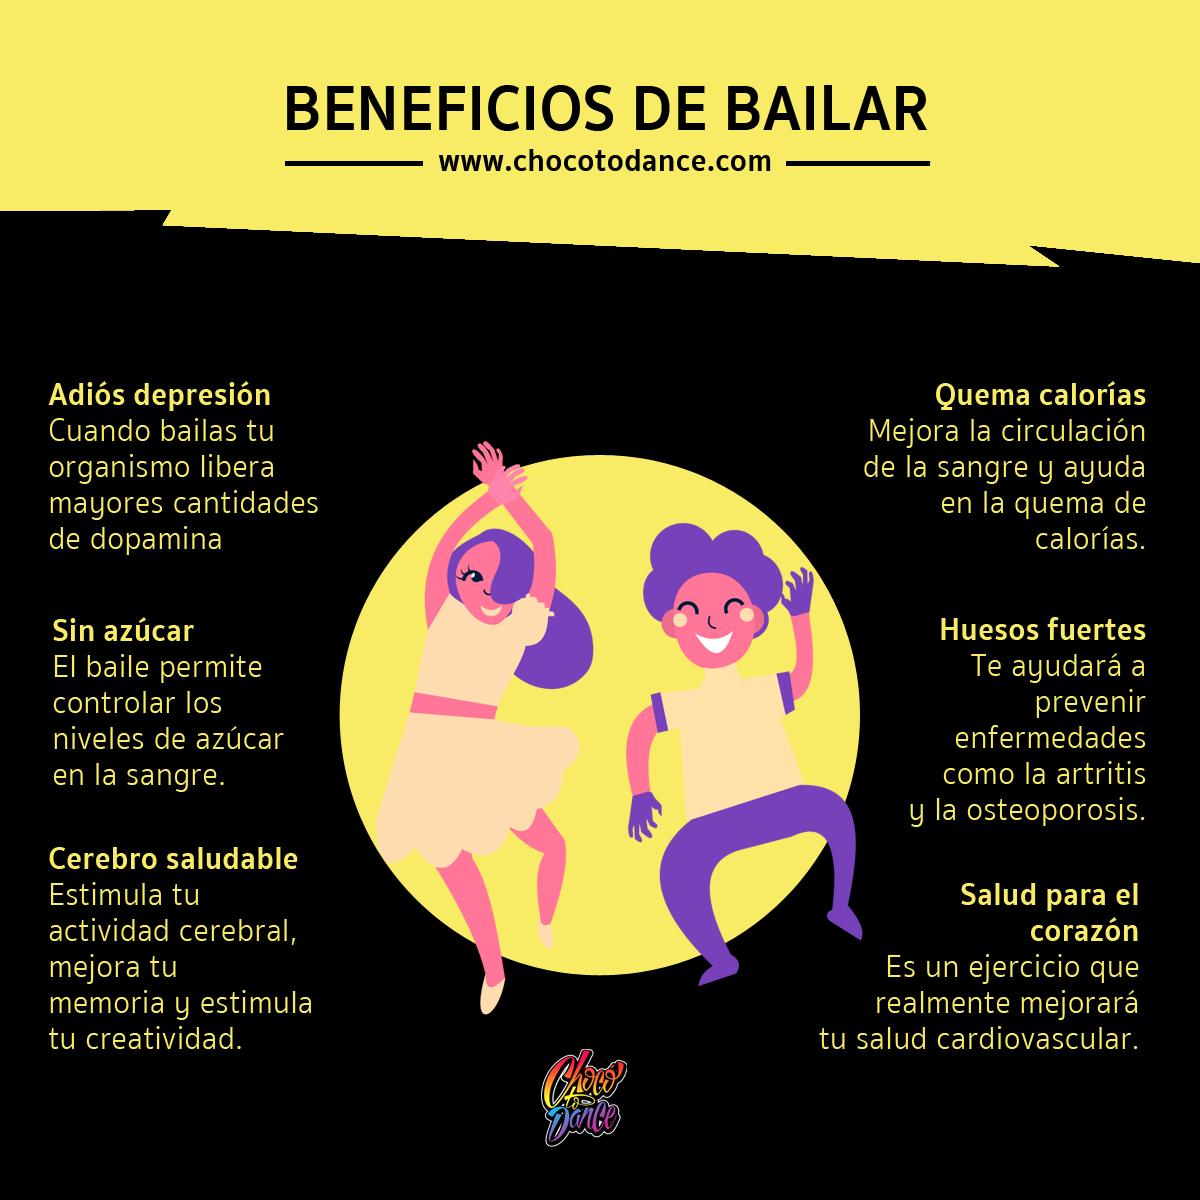 test Twitter Media - ¡Bailar te brinda #beneficios para tu #salud física y mental! https://t.co/eSziJoJyjv